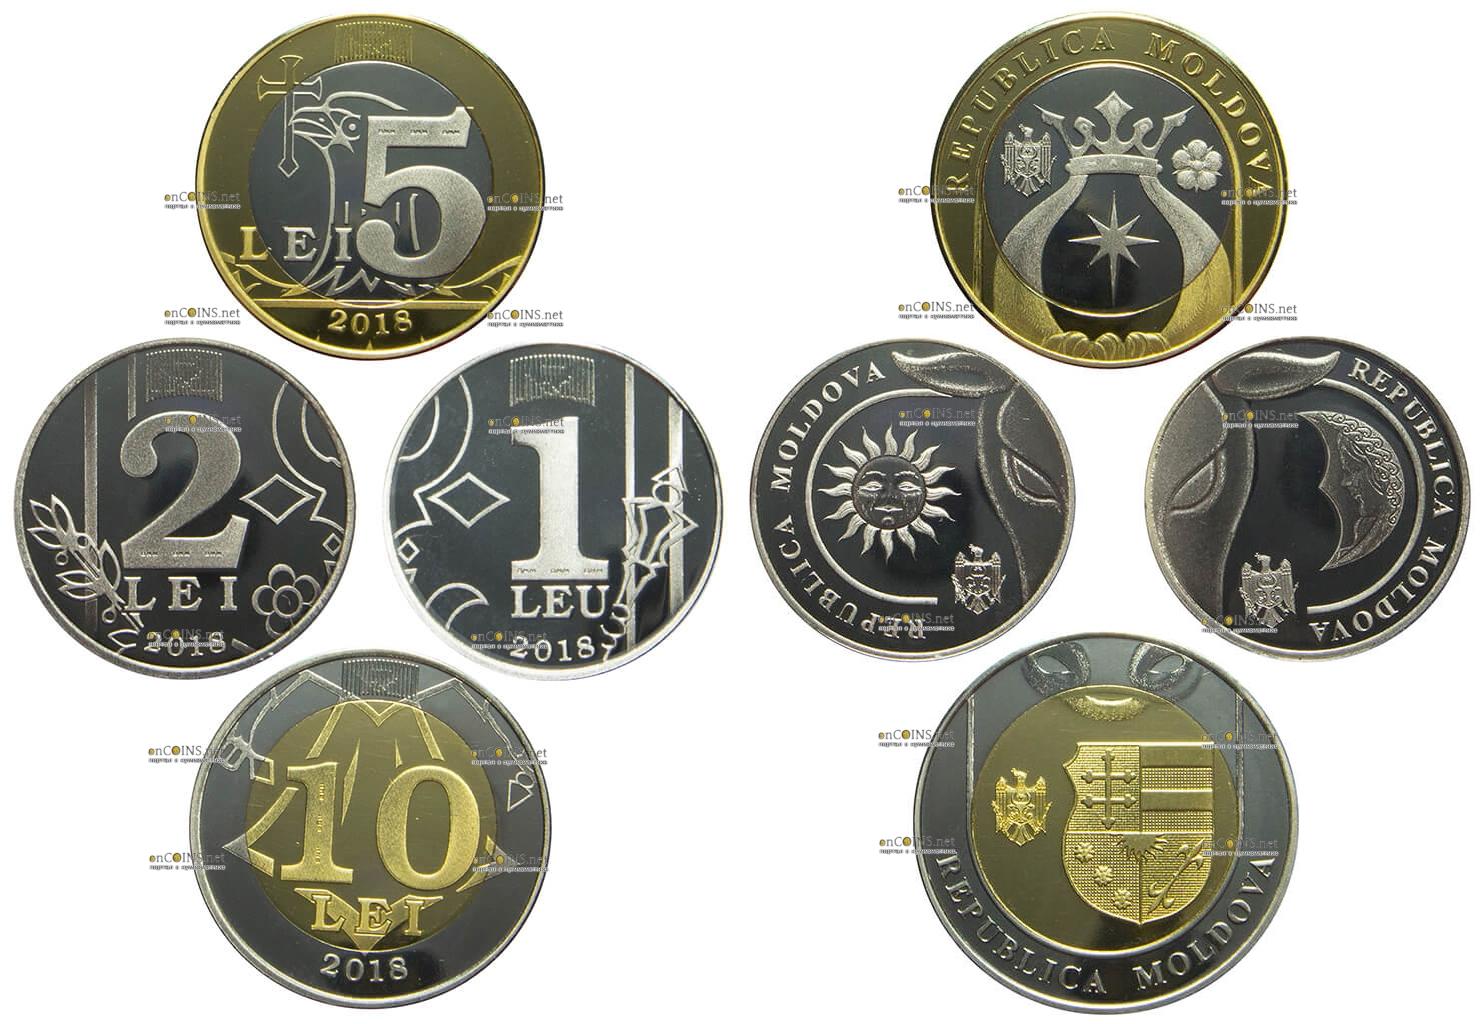 монеты Молдовы 2018 года выпуска